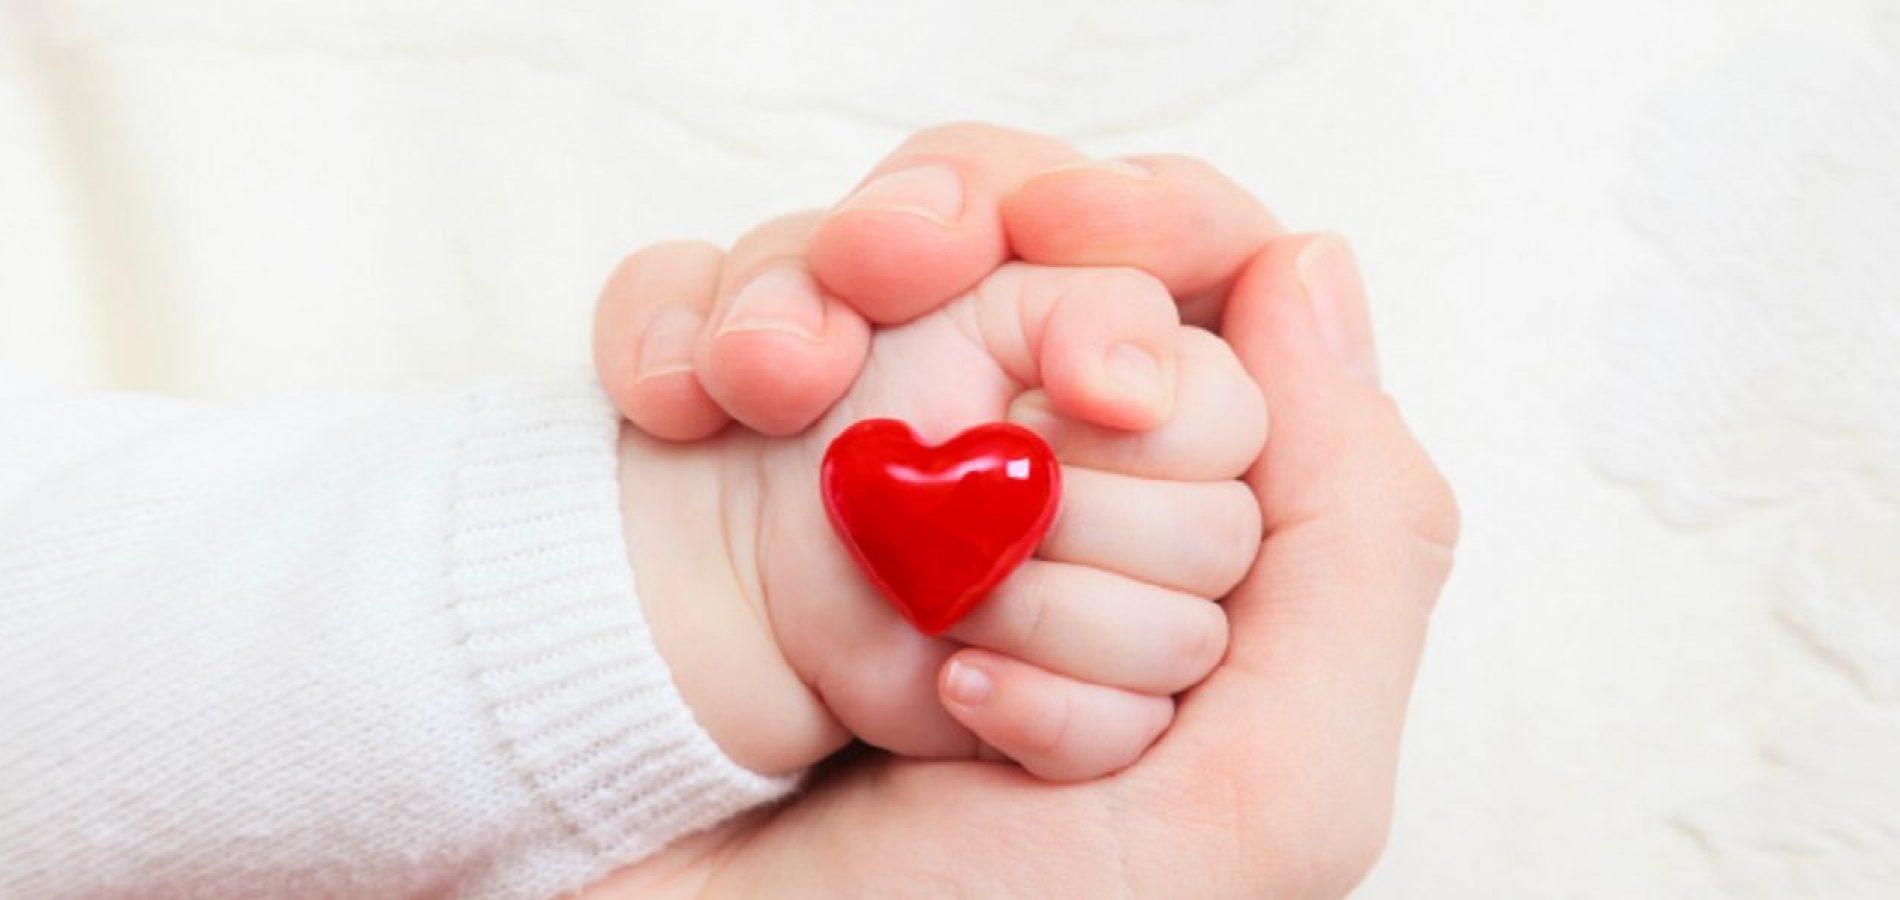 cardiopatia-congenita-1500x600-1900x900_c